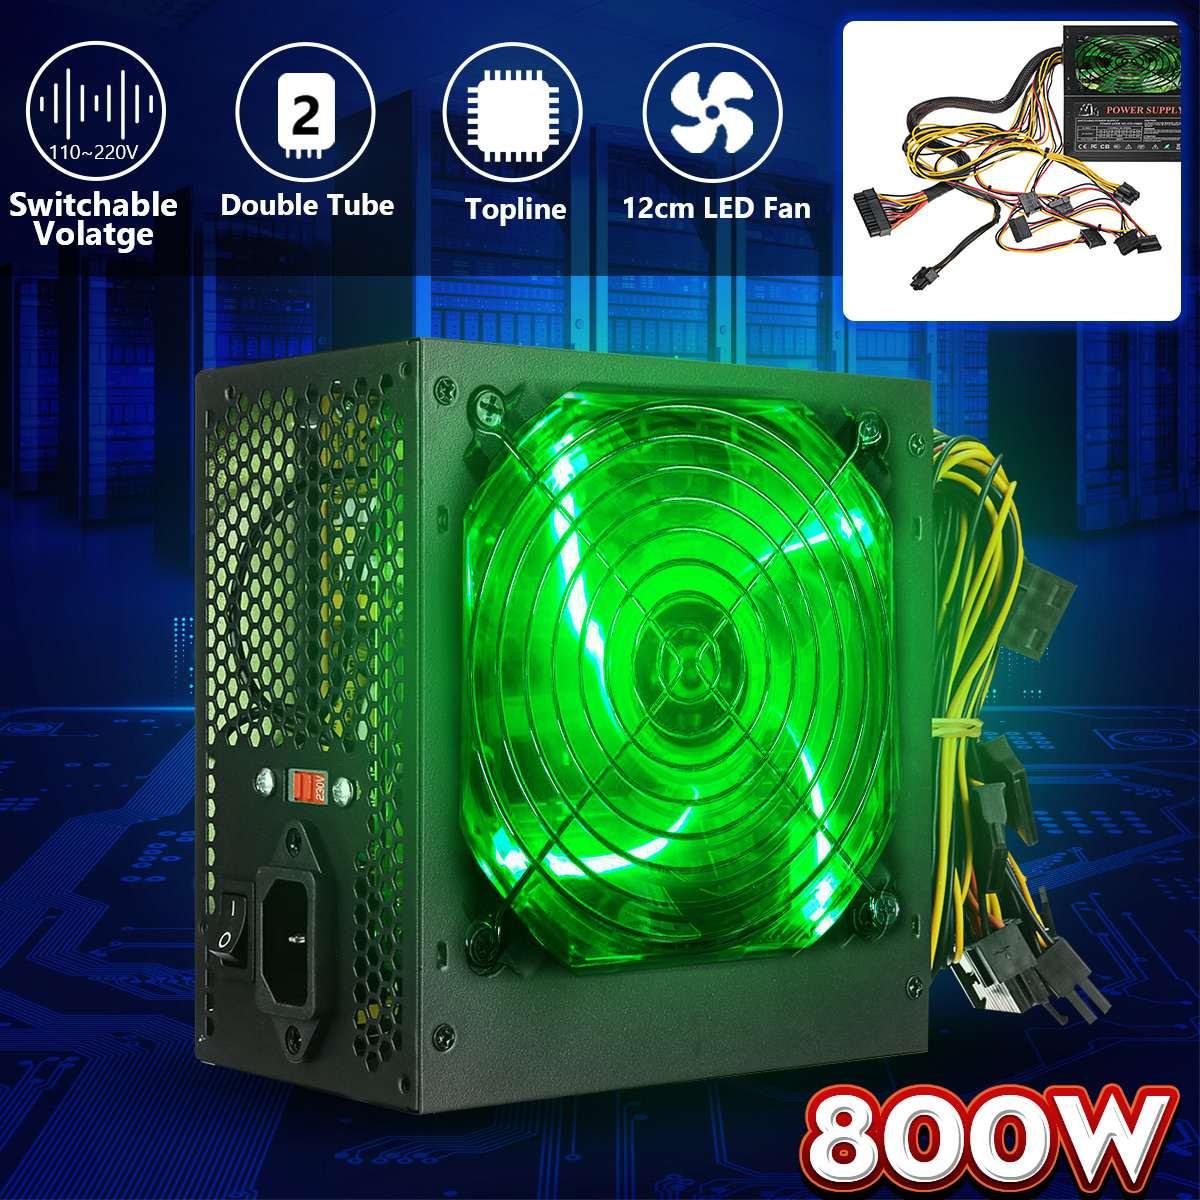 800W 110 ~ 220V PC 전원 공급 장치 지능형 온도 제어 기능이있는 12cm LED 무음 팬 Intel AMD ATX 12V 데스크탑 컴퓨터 용